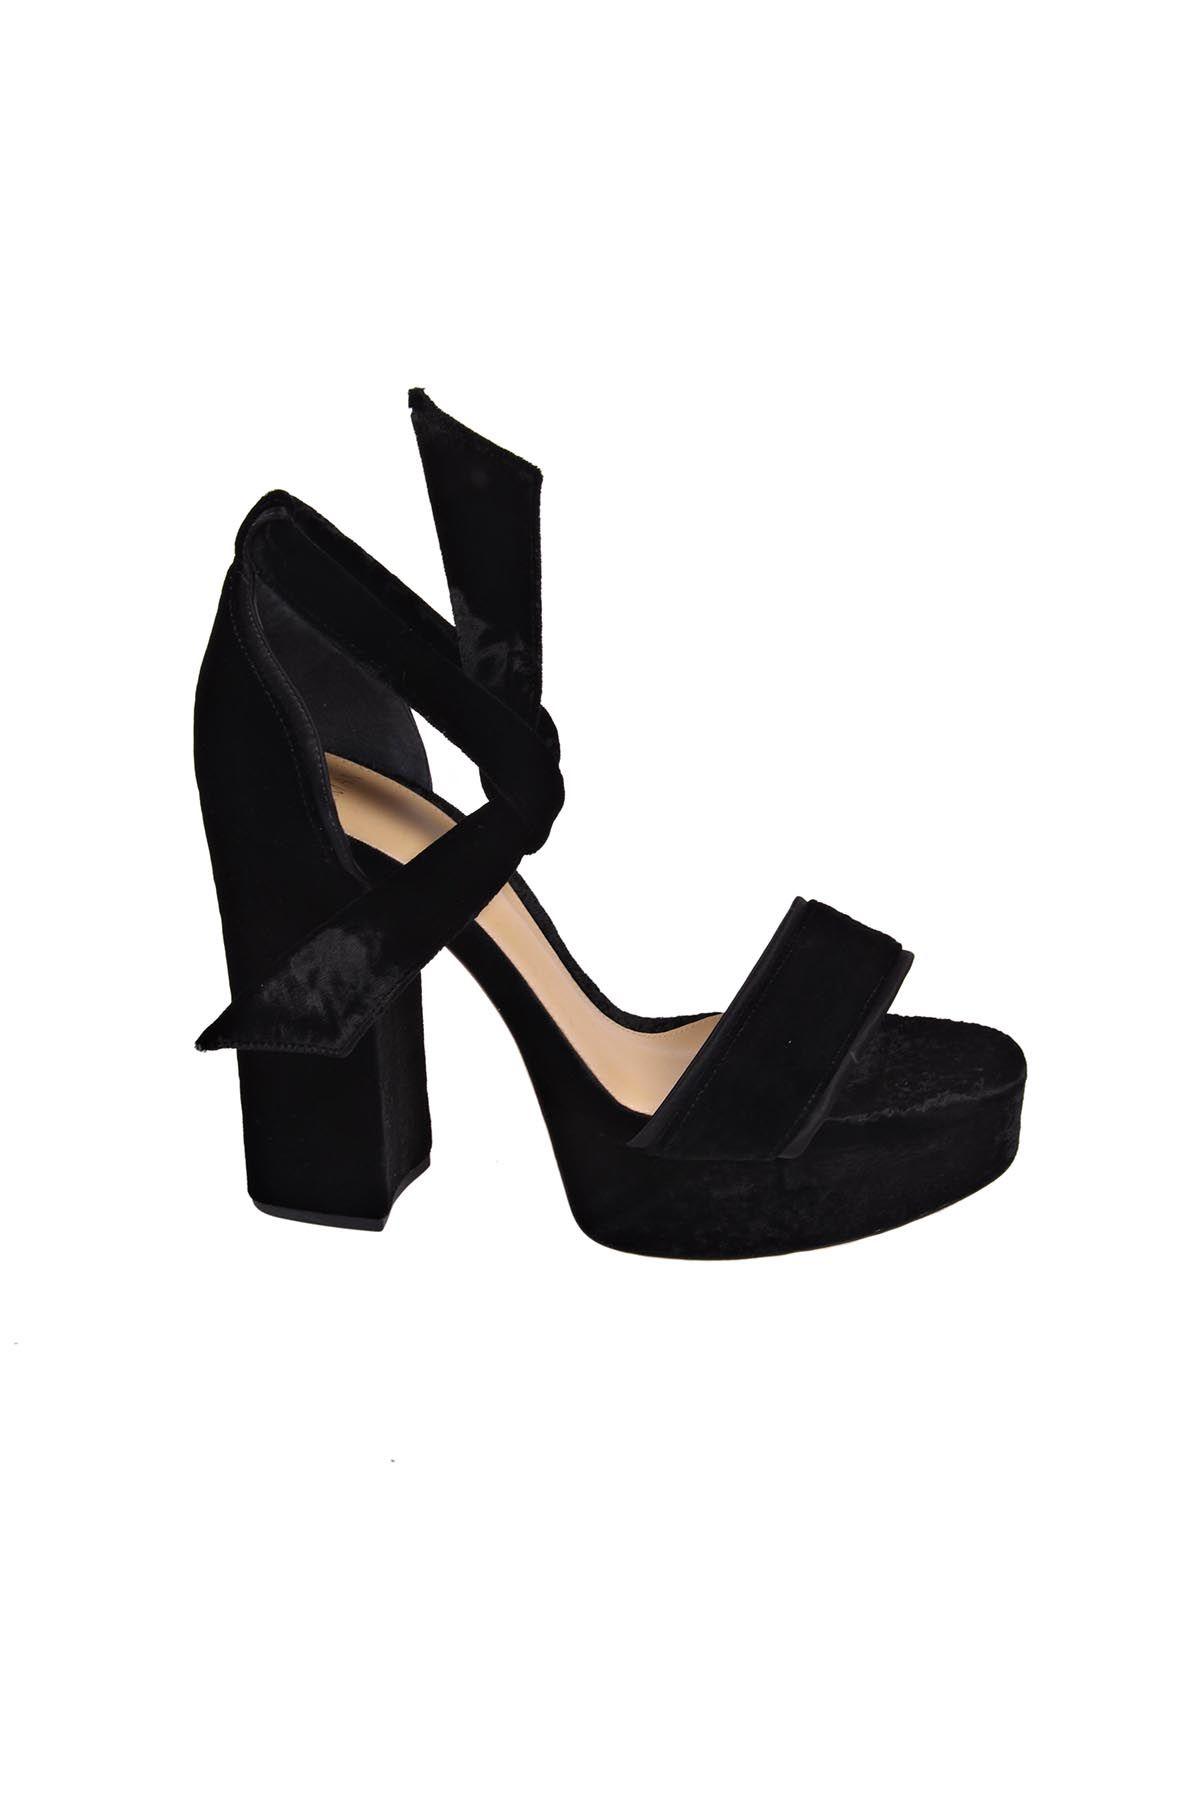 Alexandre Birman Celine Sandals